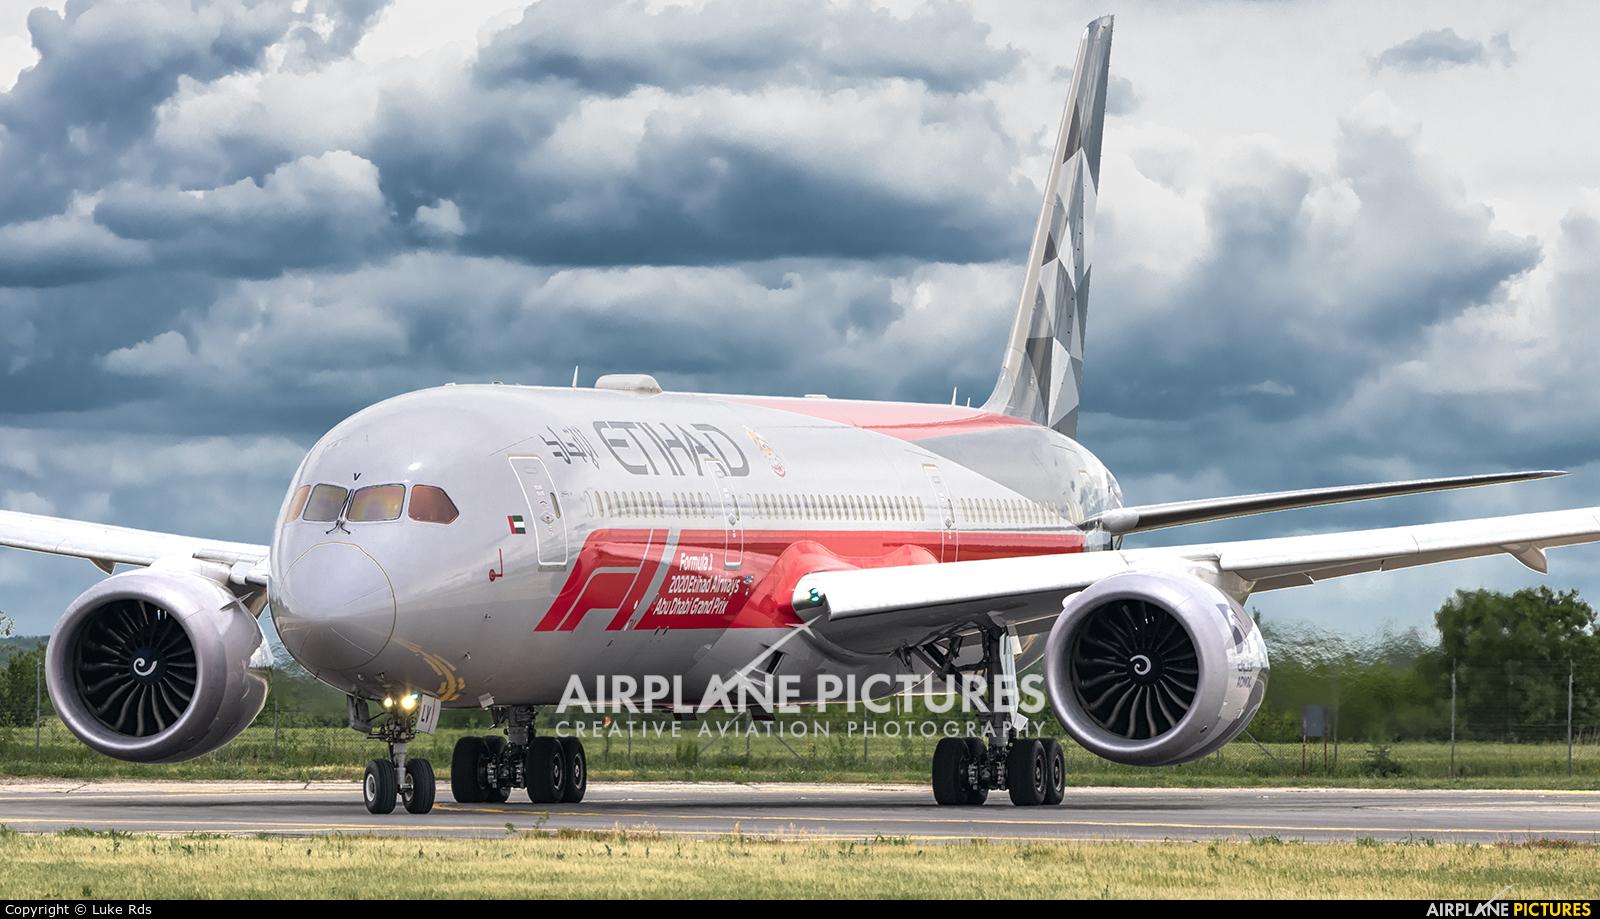 Etihad Airways A6-BLV aircraft at Bucharest - Henri Coandă